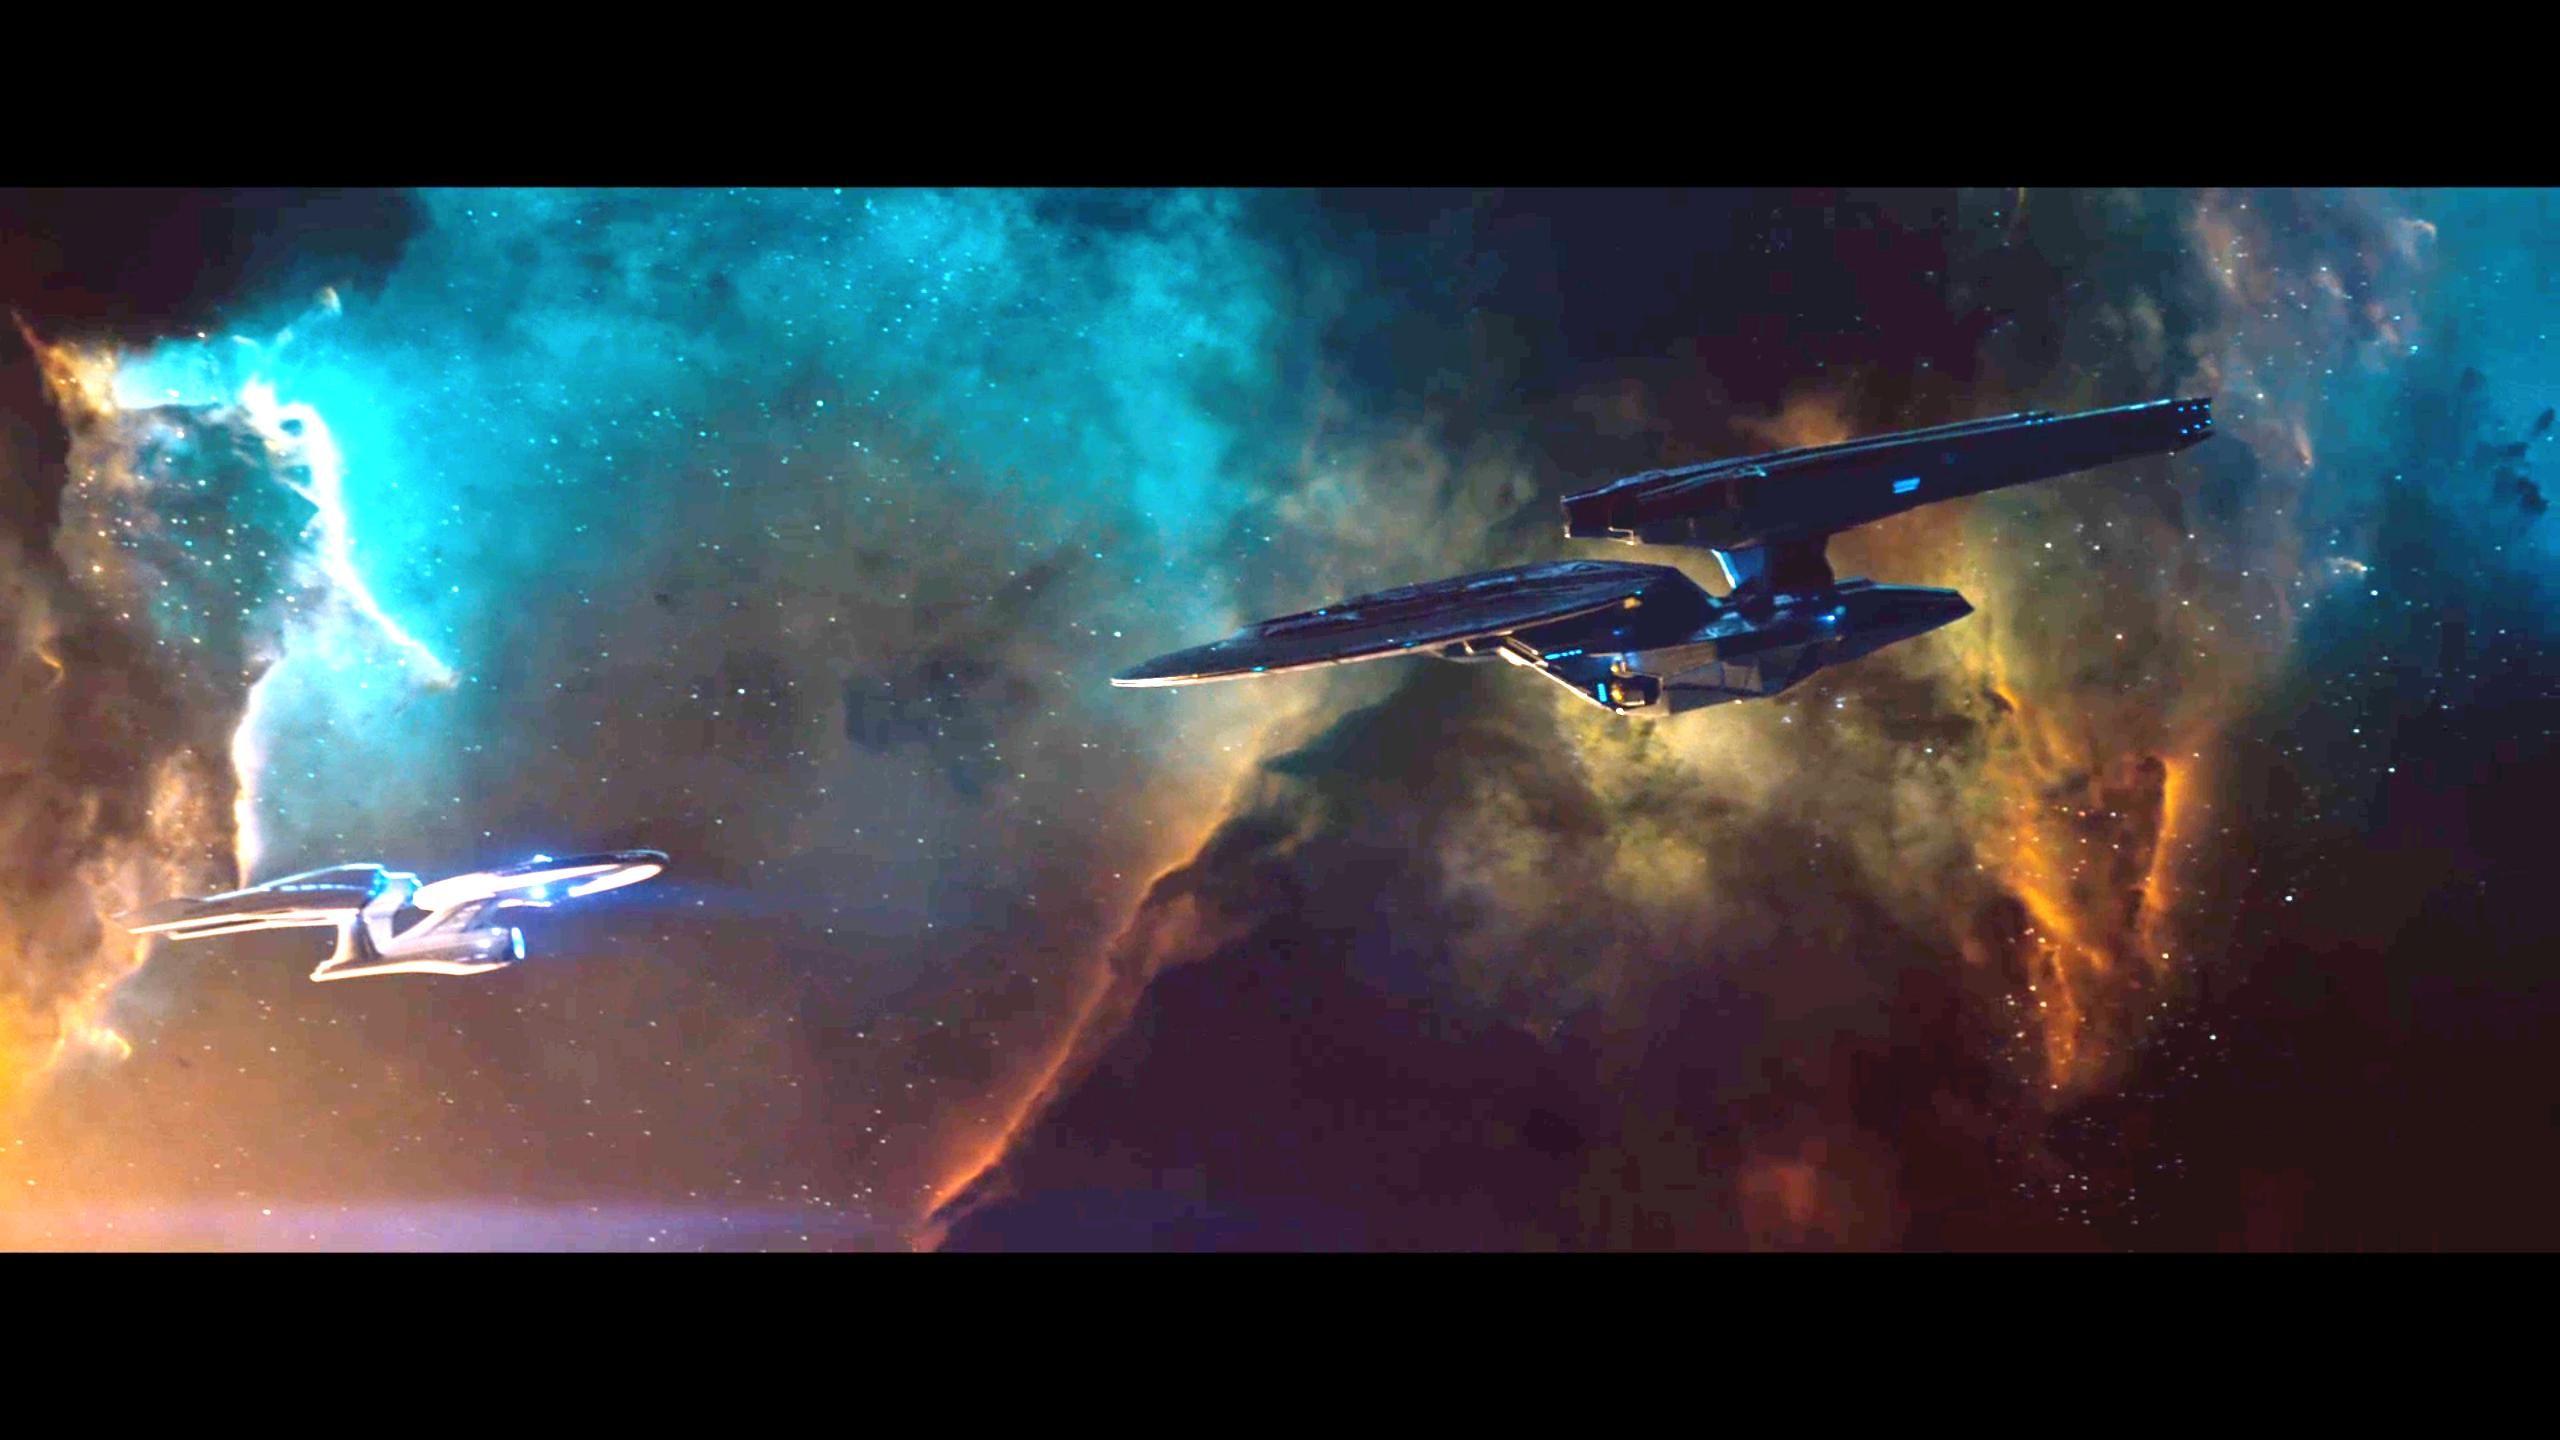 Star Trek Into Darkness 2013 Movie HD Wide Wallpaper for Widescreen (78  Wallpapers)